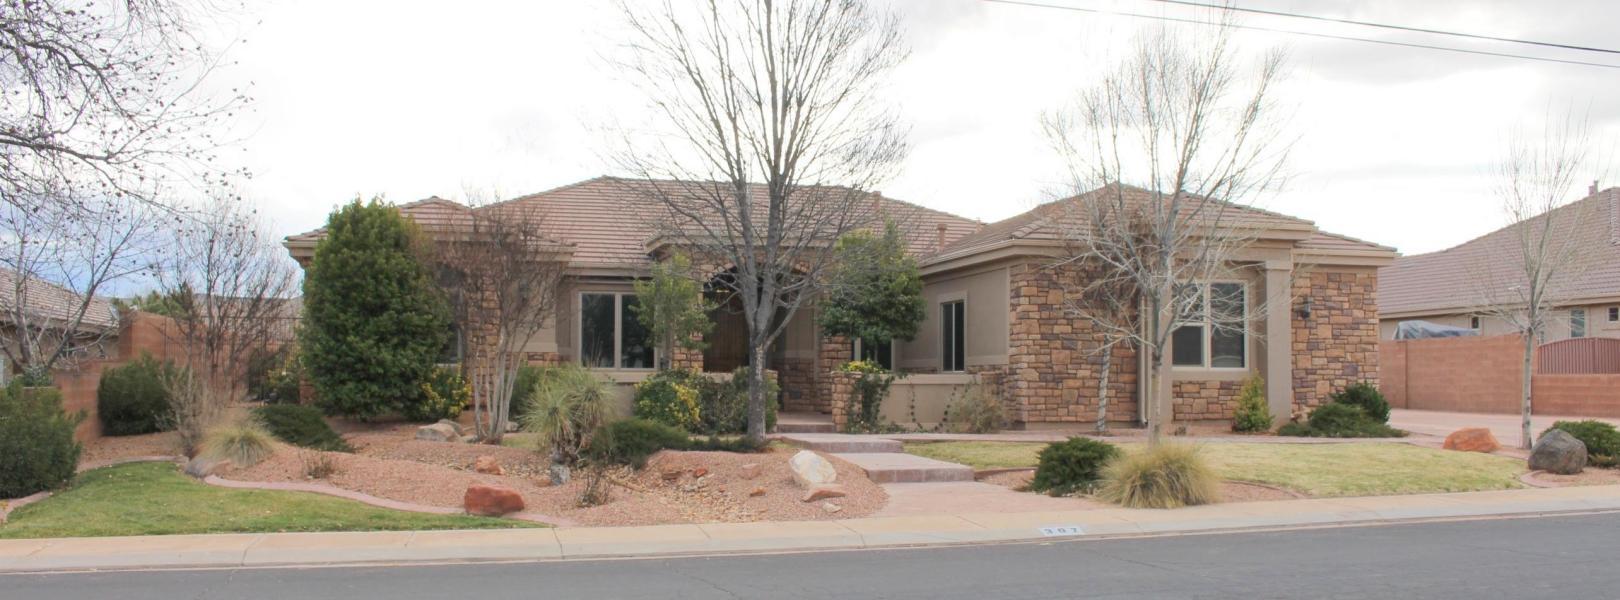 Single Family Home for Sale at 307 1150 307 1150 Hurricane, Utah 84737 United States